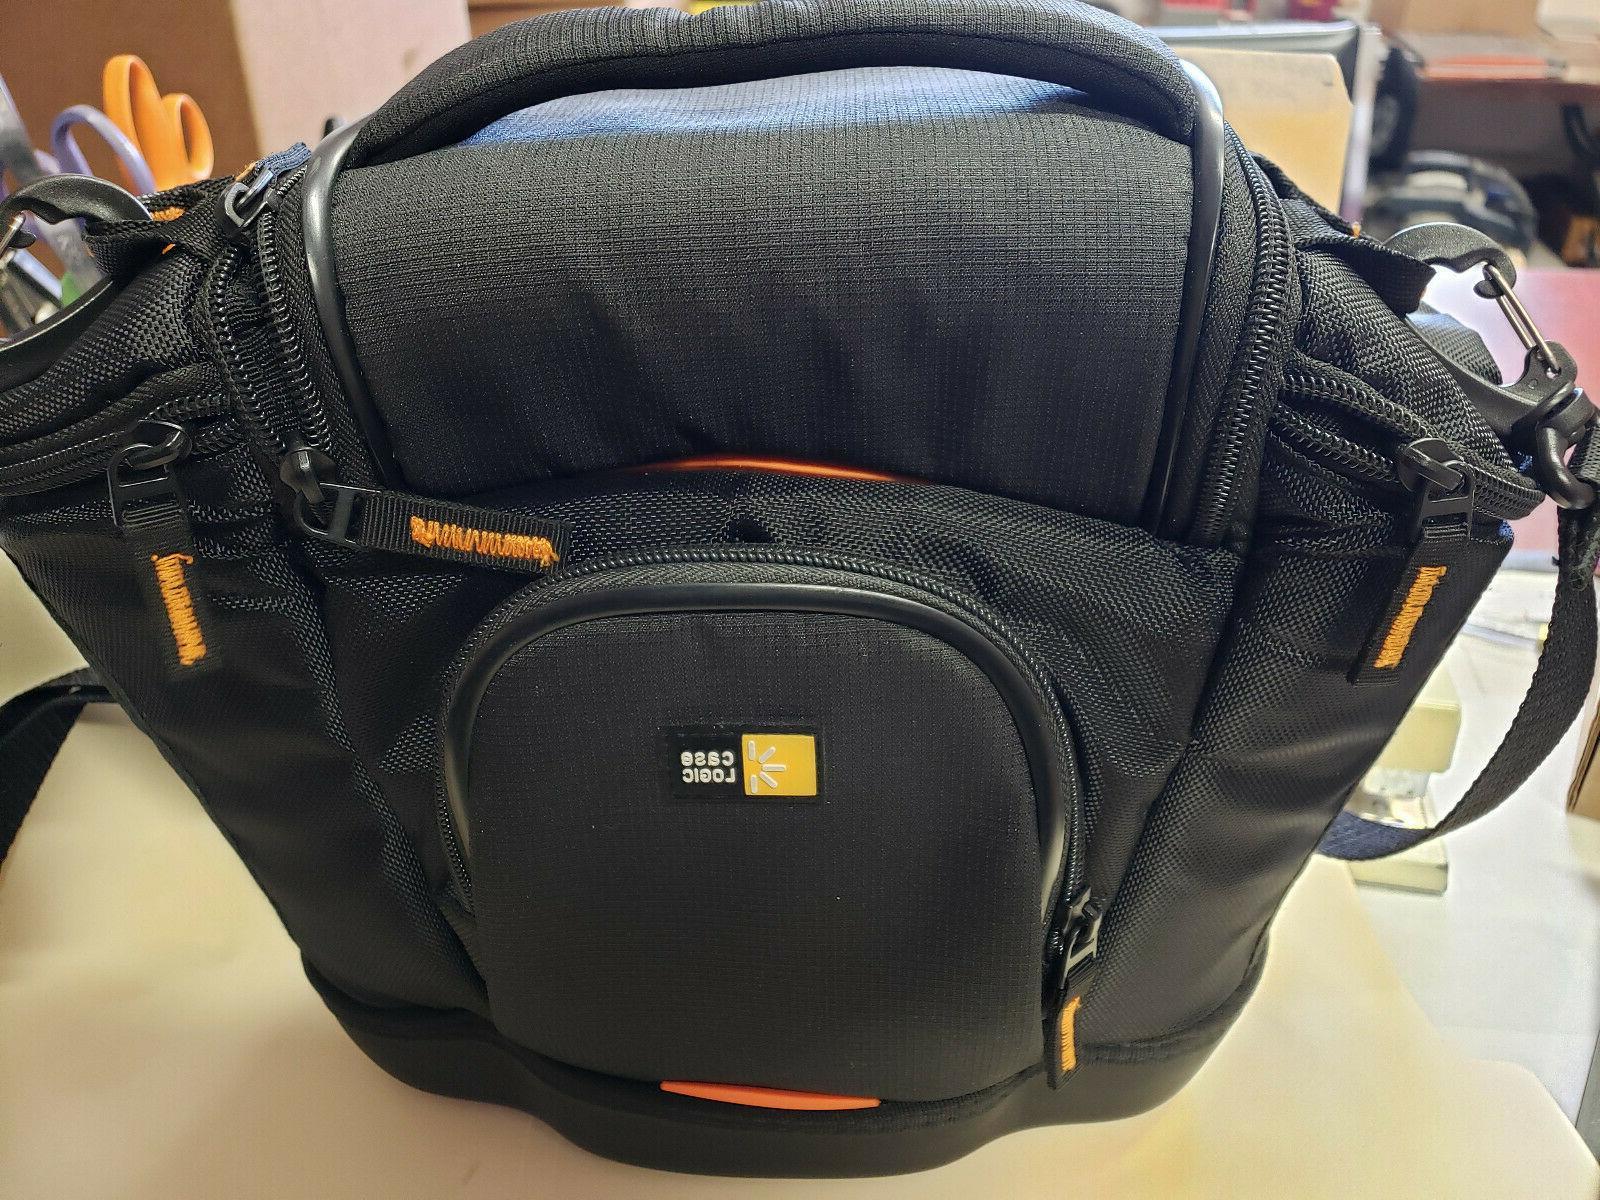 slrc 202 medium dslr camera bag black